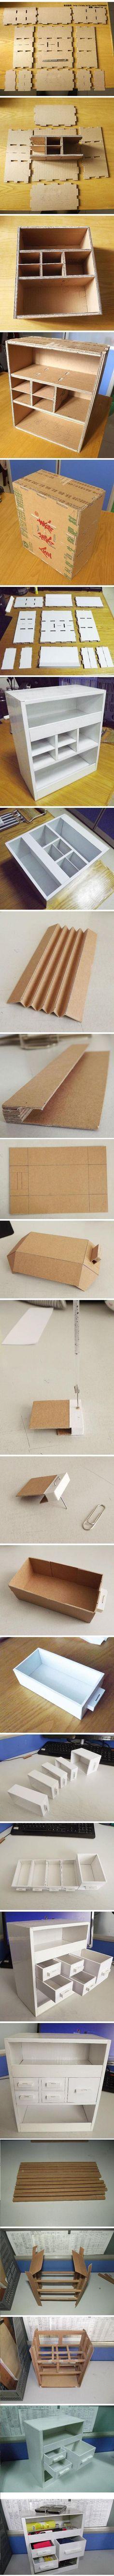 cardboard shelf and drawers